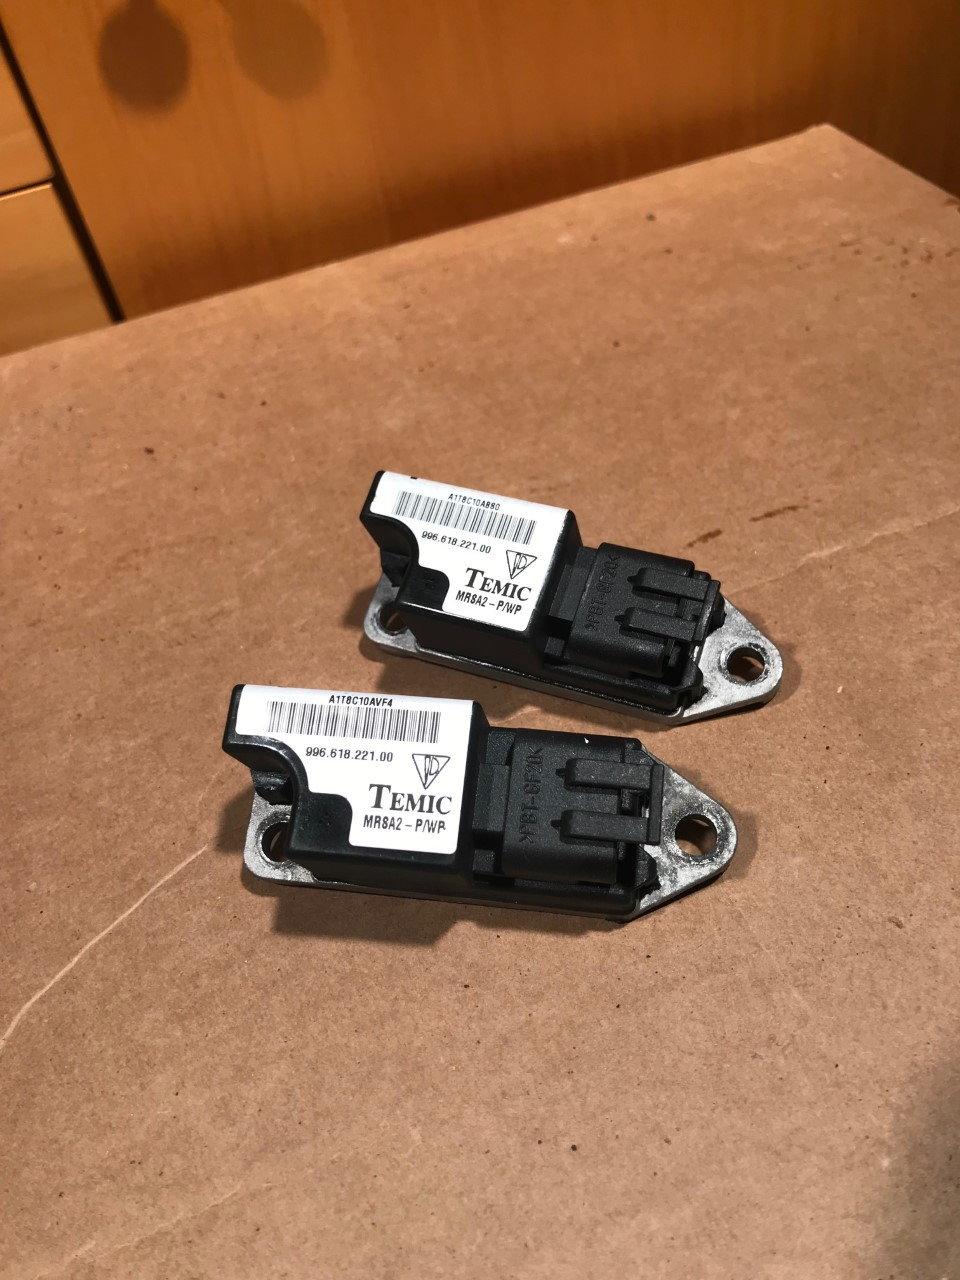 996 618 221 00 Side Airbag Sensor